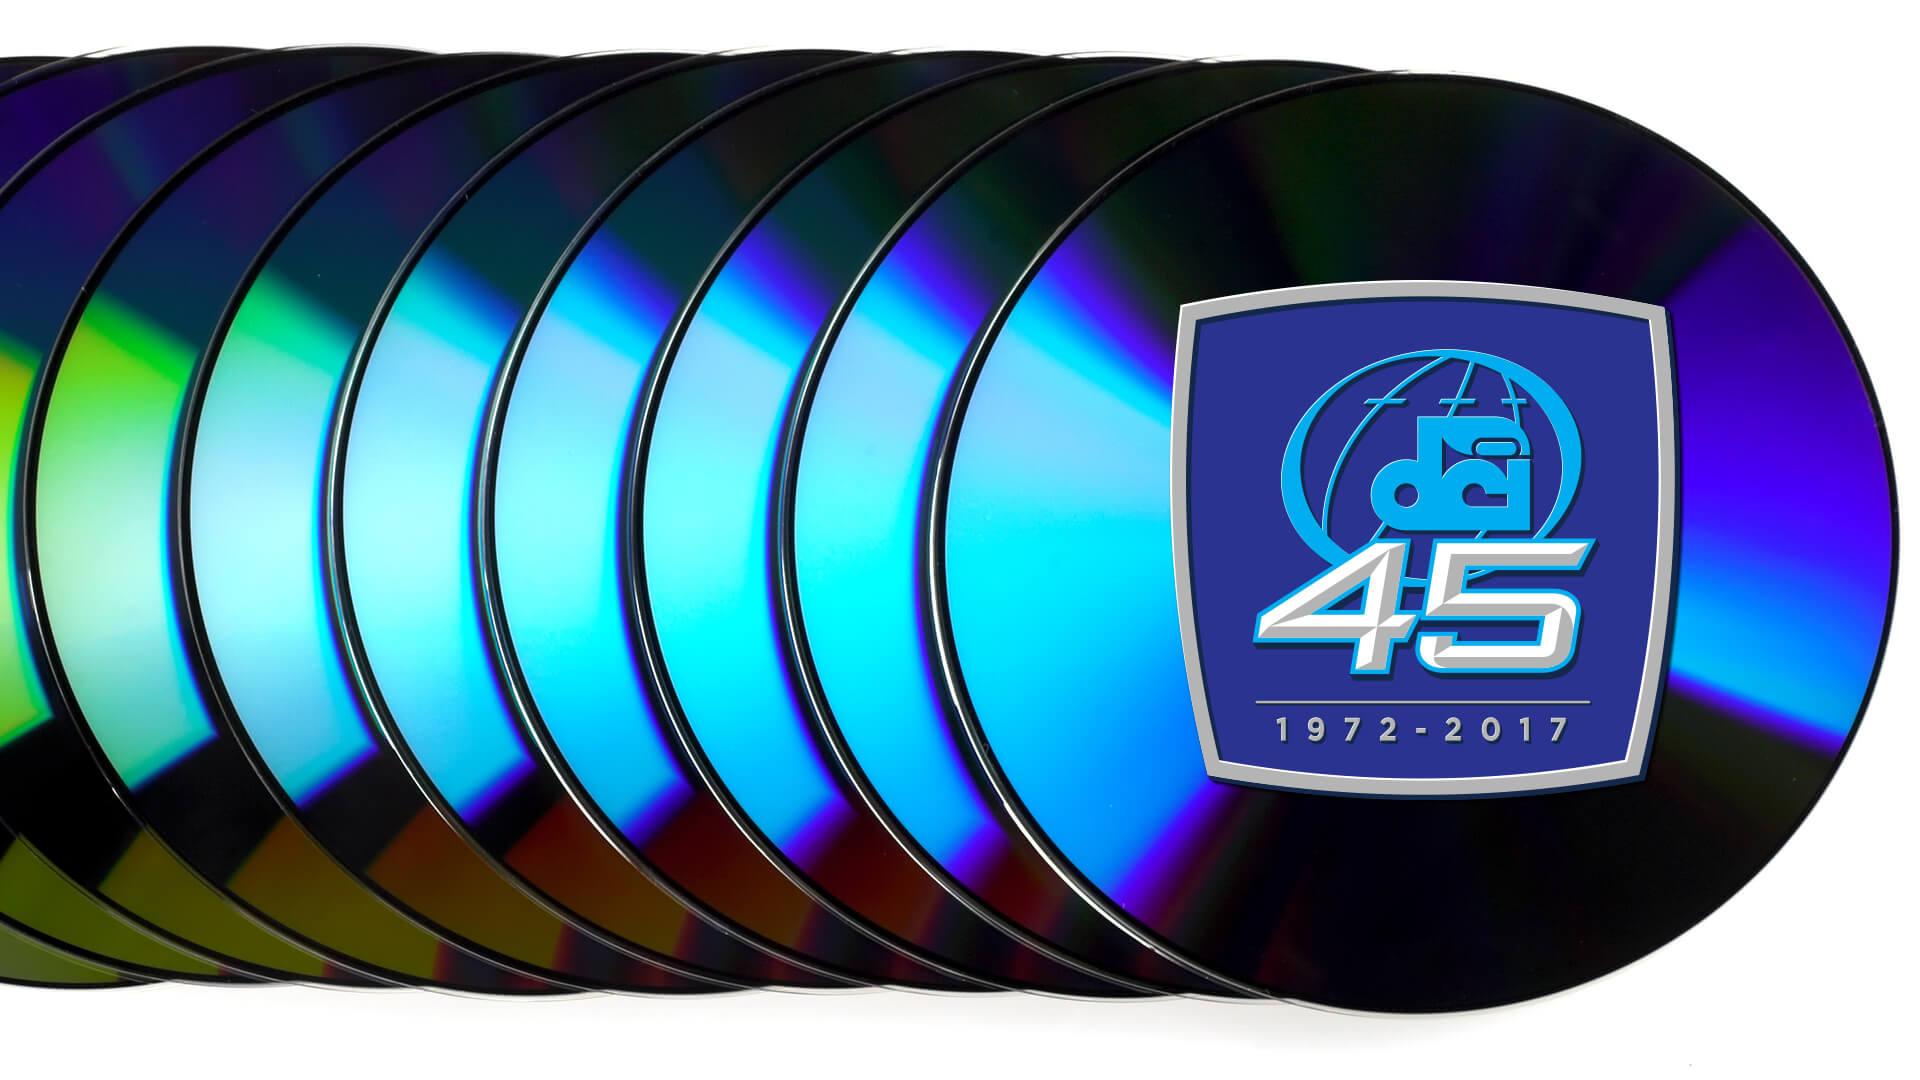 FAQs: 2017 DCI World Championship Audio/Video